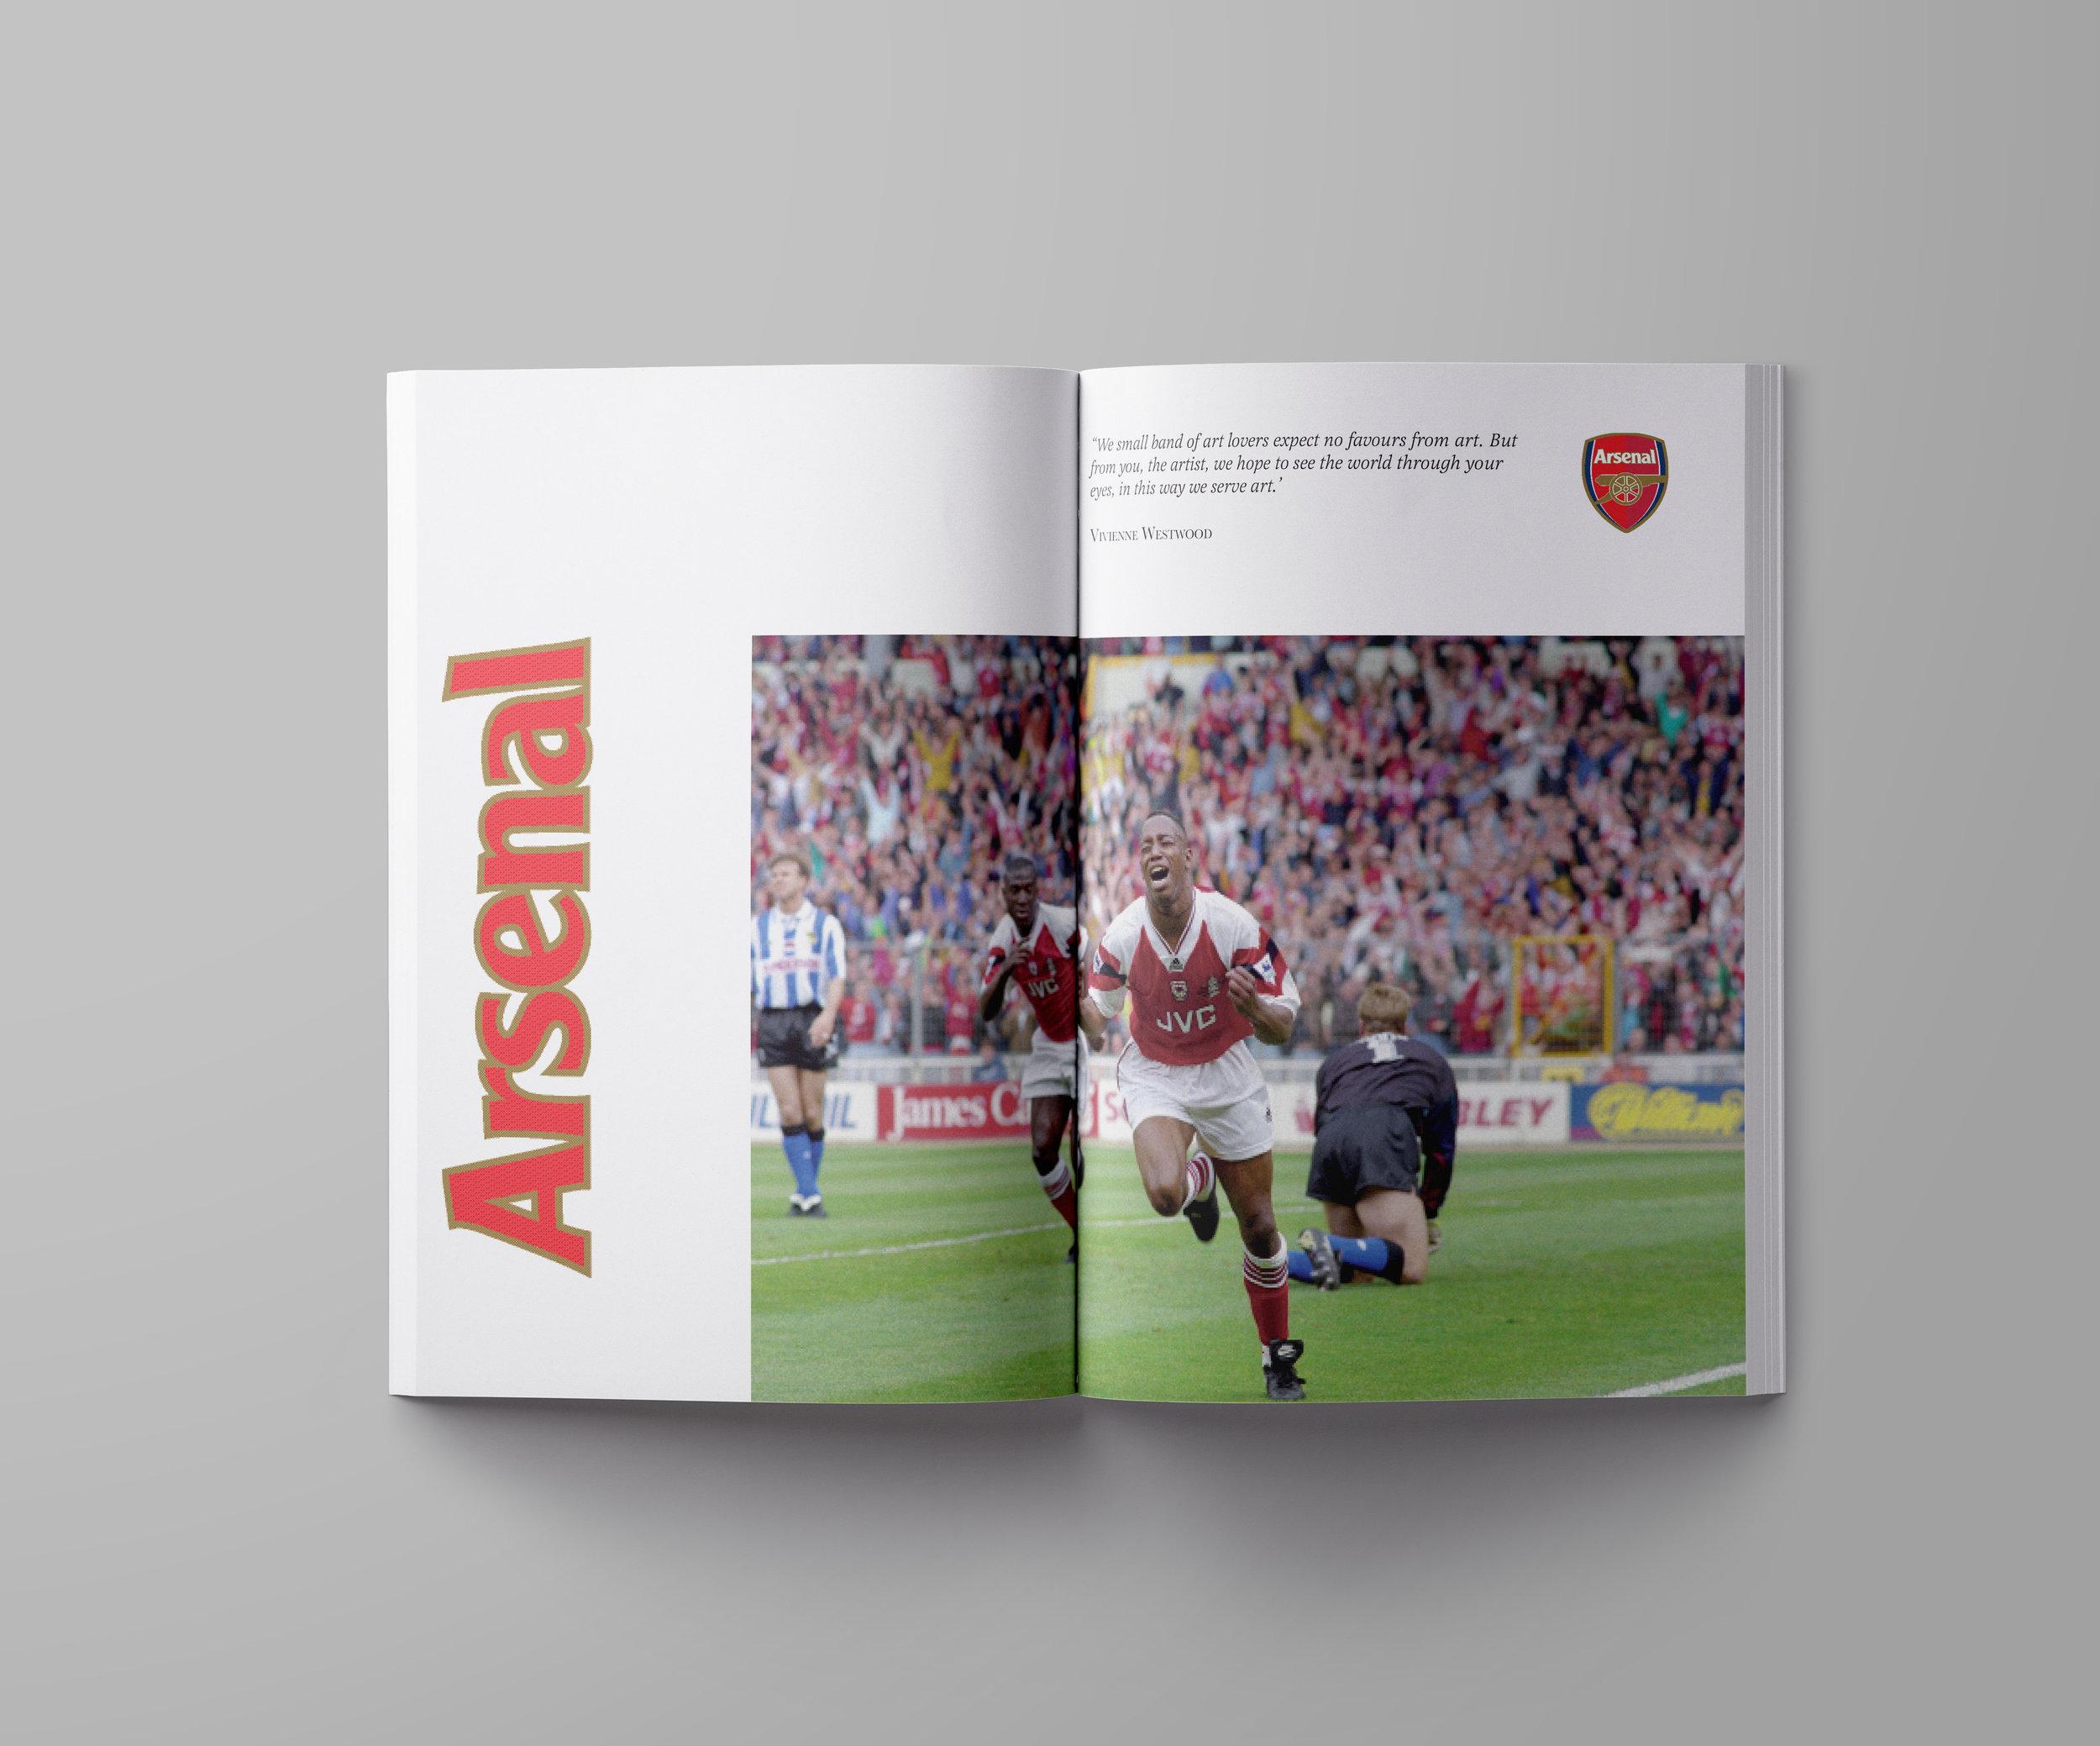 Magazine-USLetter-A4-Mockup-Template-arsenali.jpg